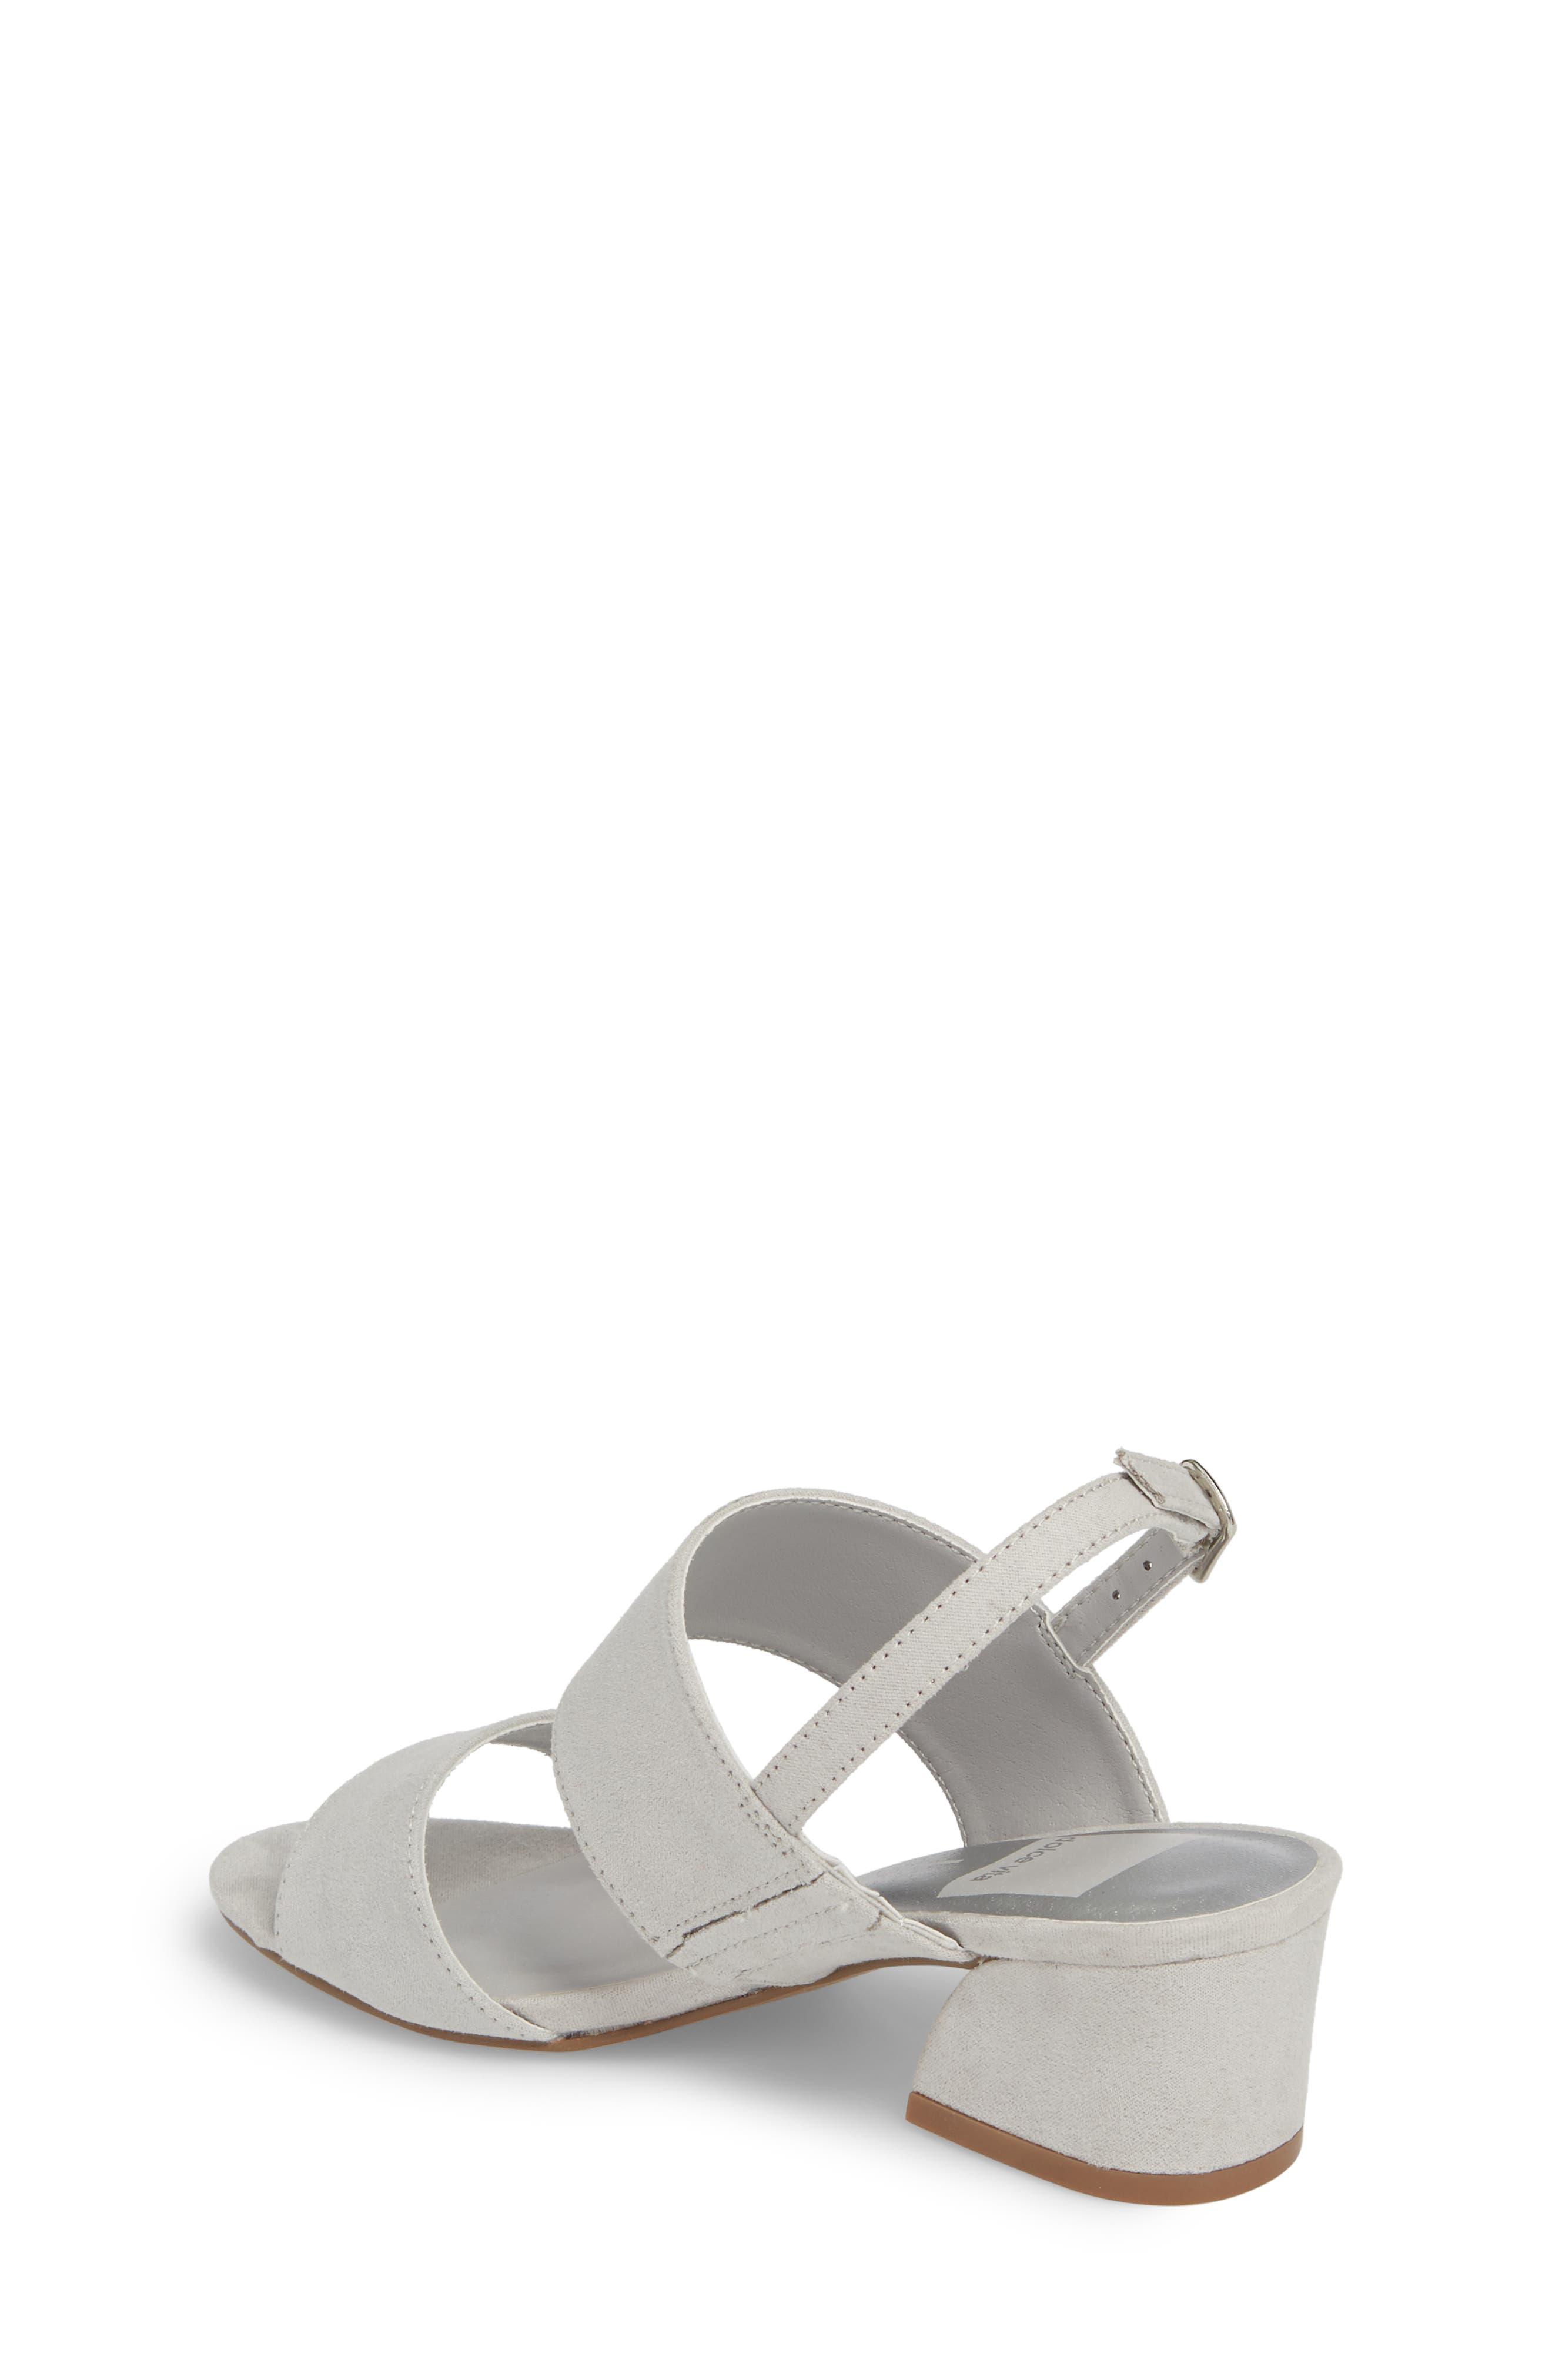 Lorne Flared Heel Sandal,                             Alternate thumbnail 2, color,                             Light Grey